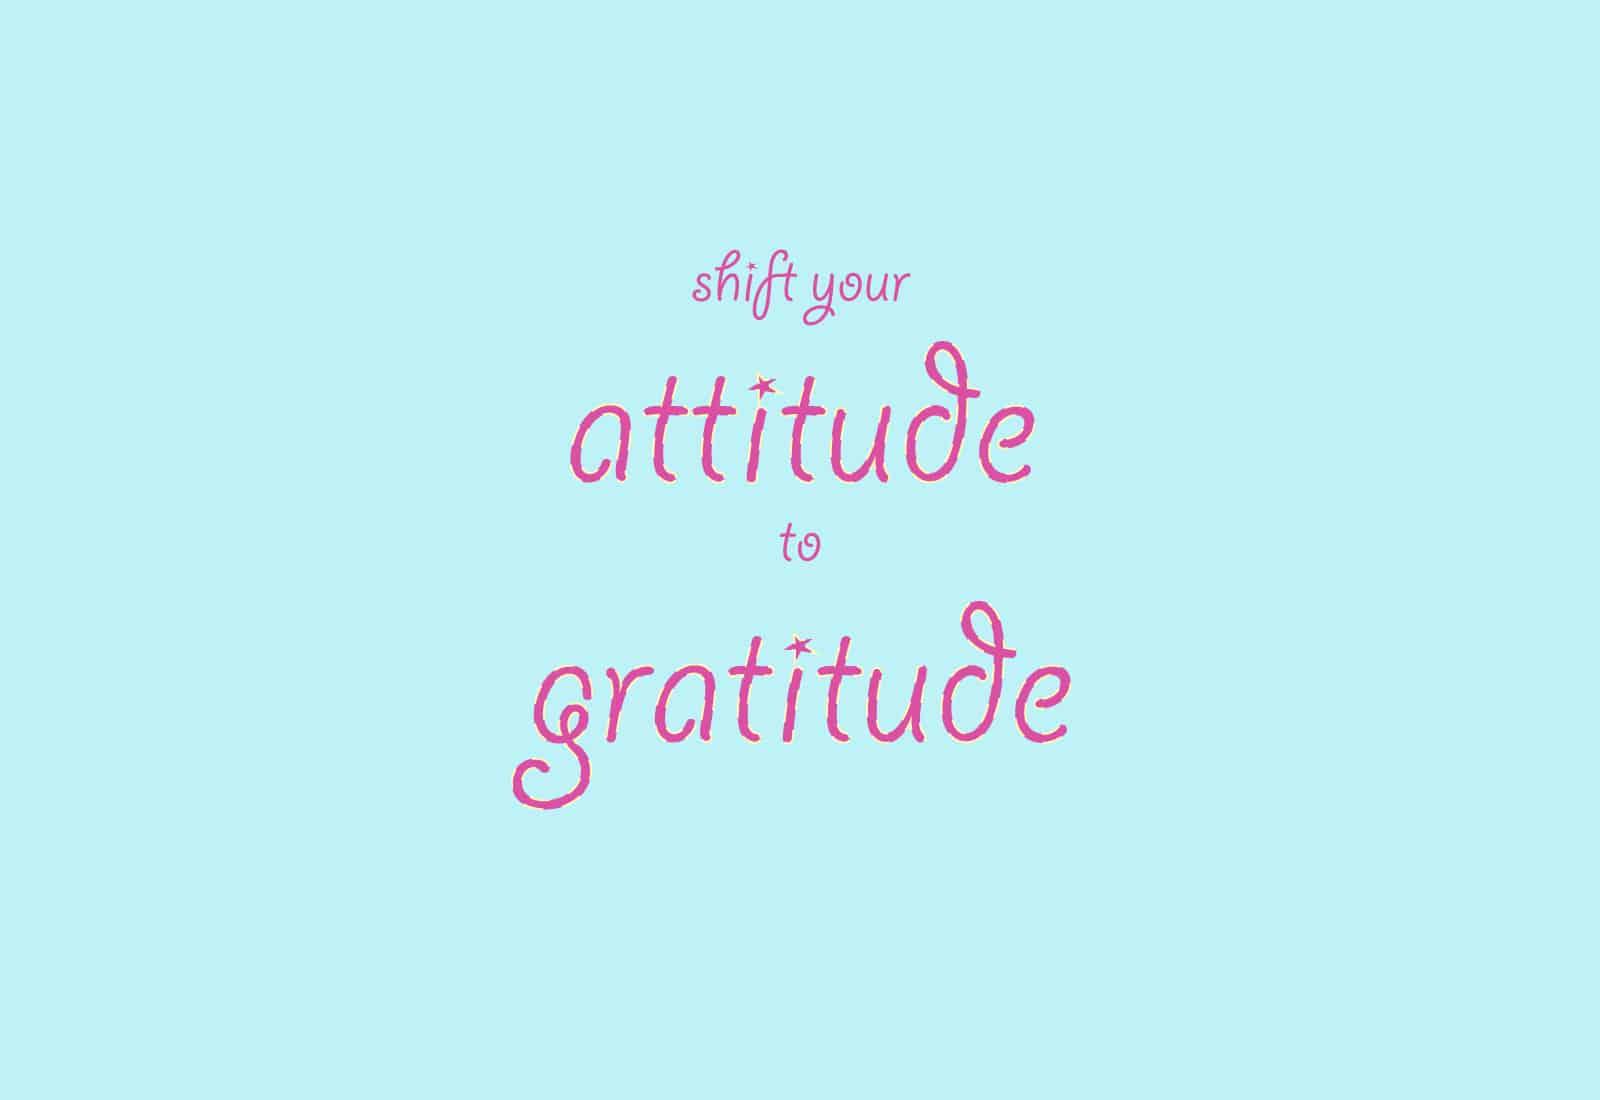 shift your attitude to gratitude